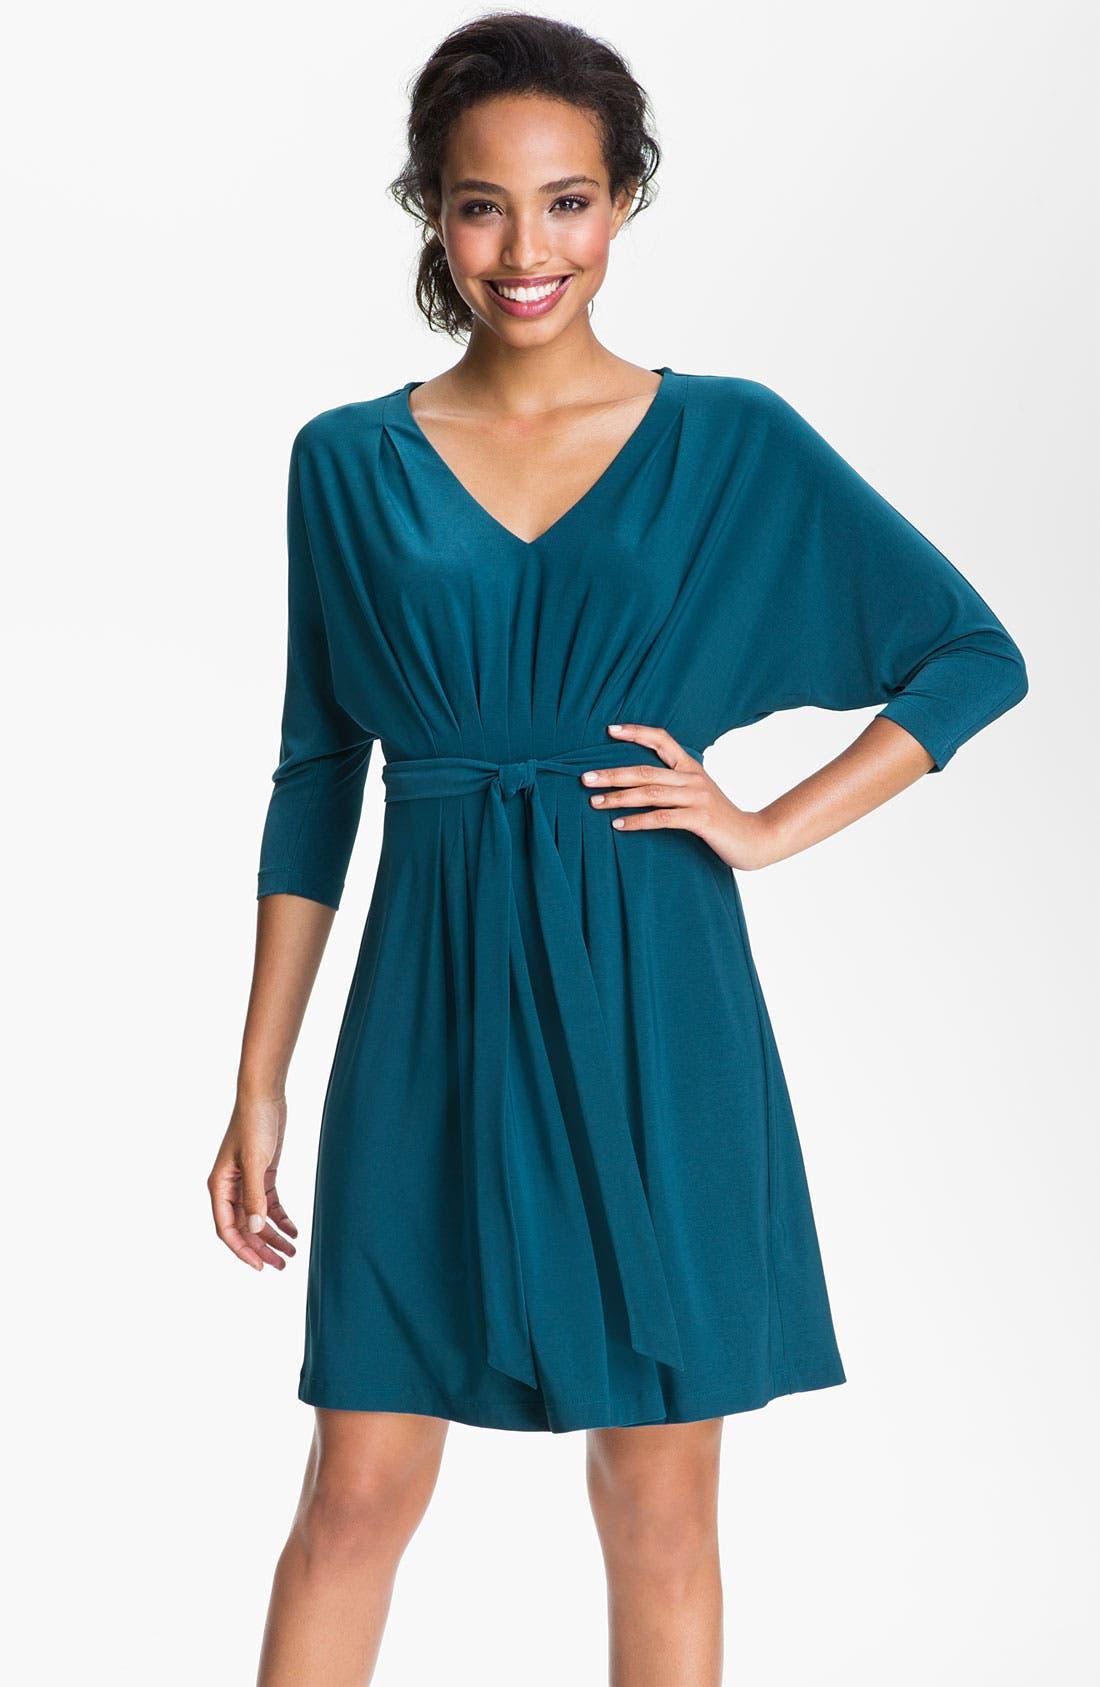 Main Image - Alex & Ava Dolman Sleeve Jersey Dress